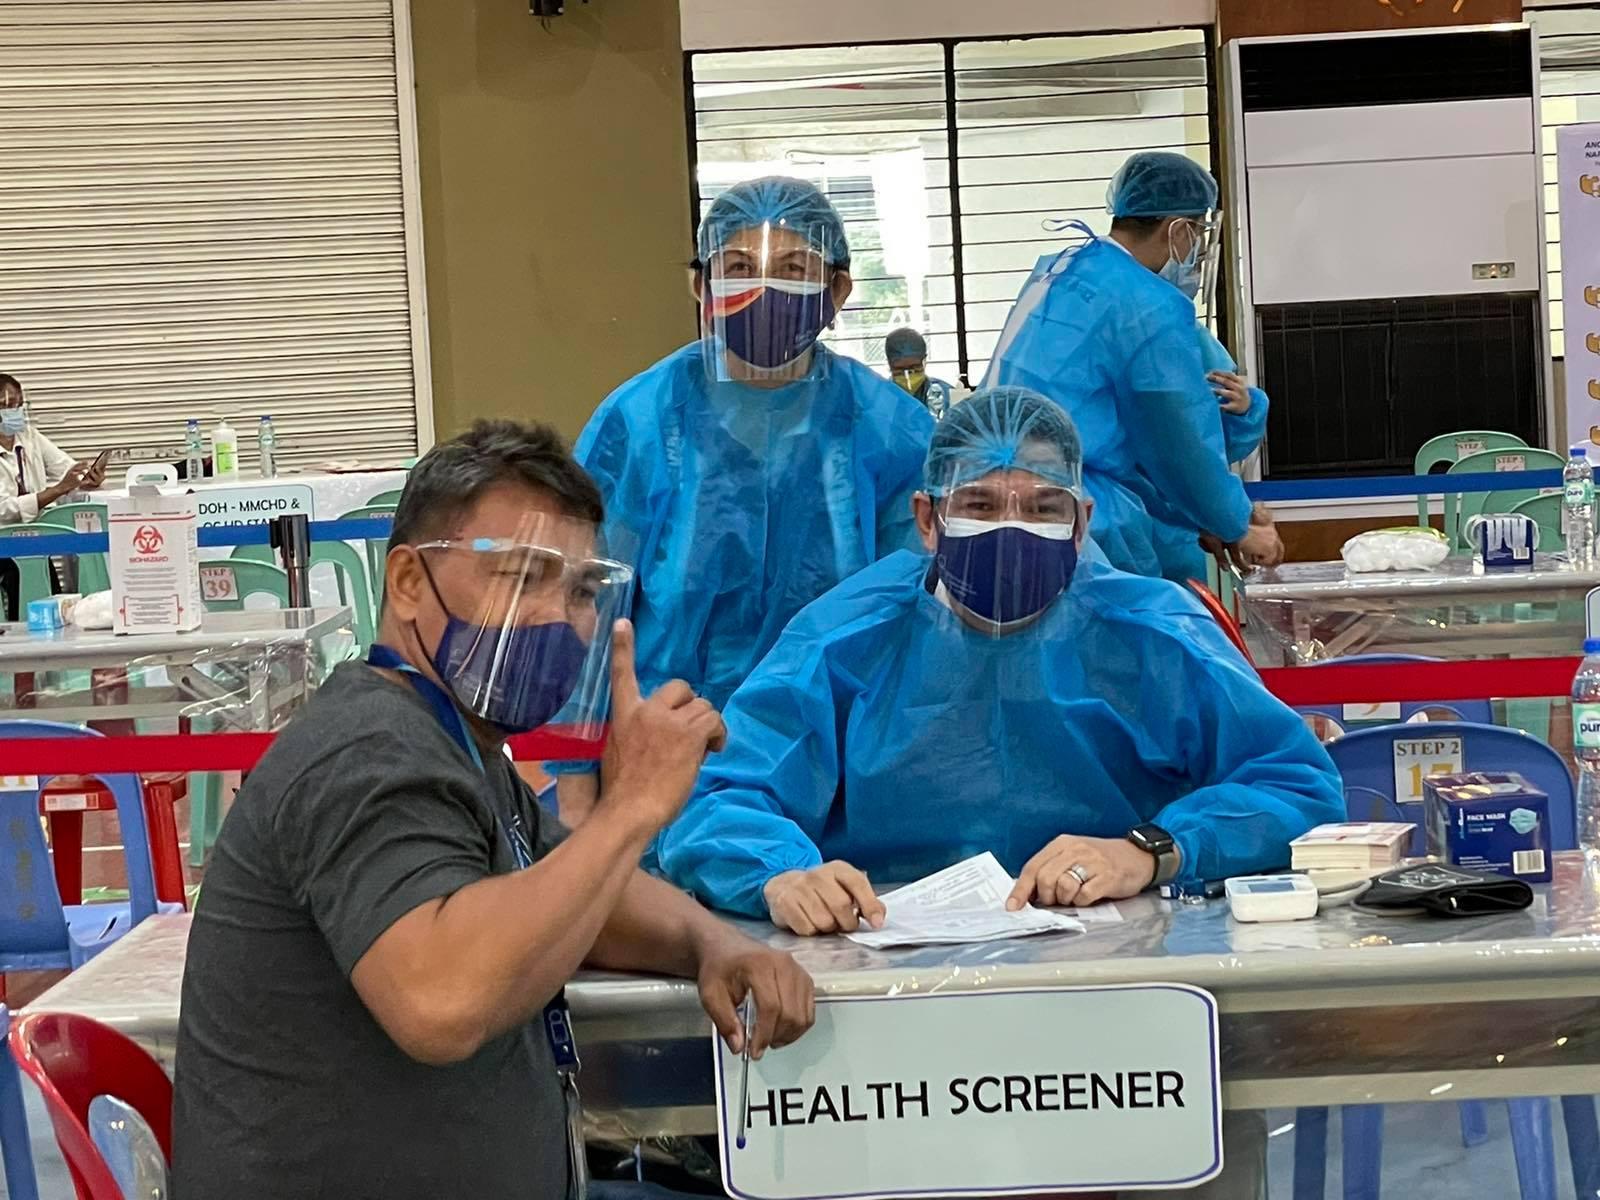 Screening before vaccination